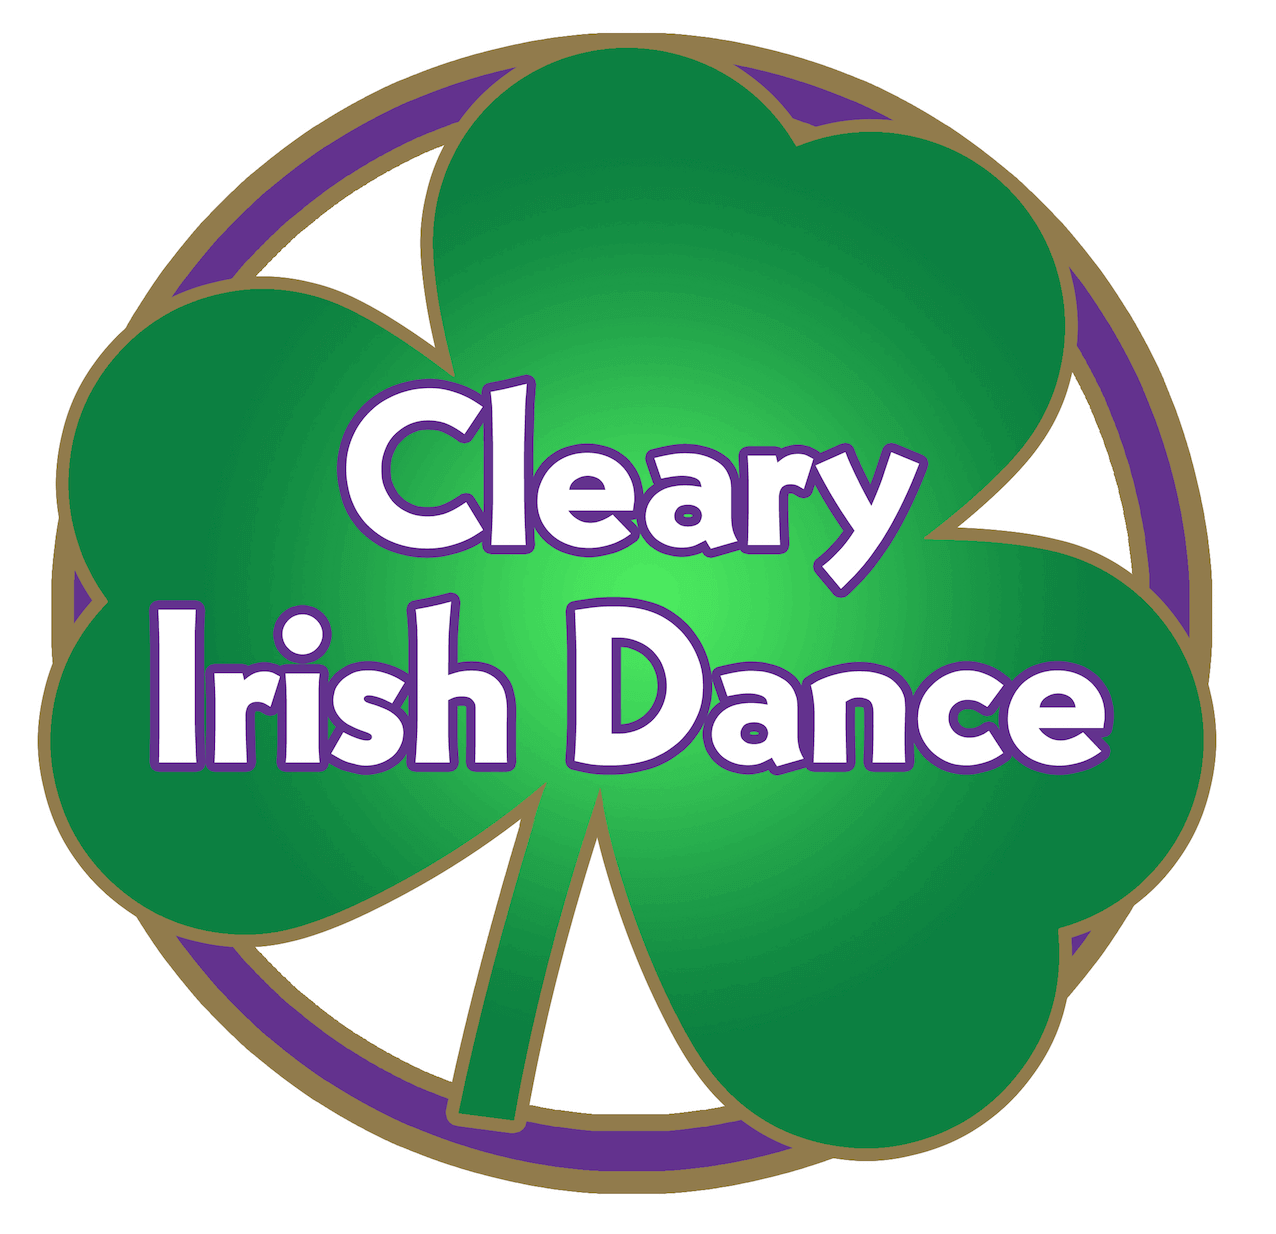 Free Irish Dance Lesson at Cleary Irish Dance Torrance